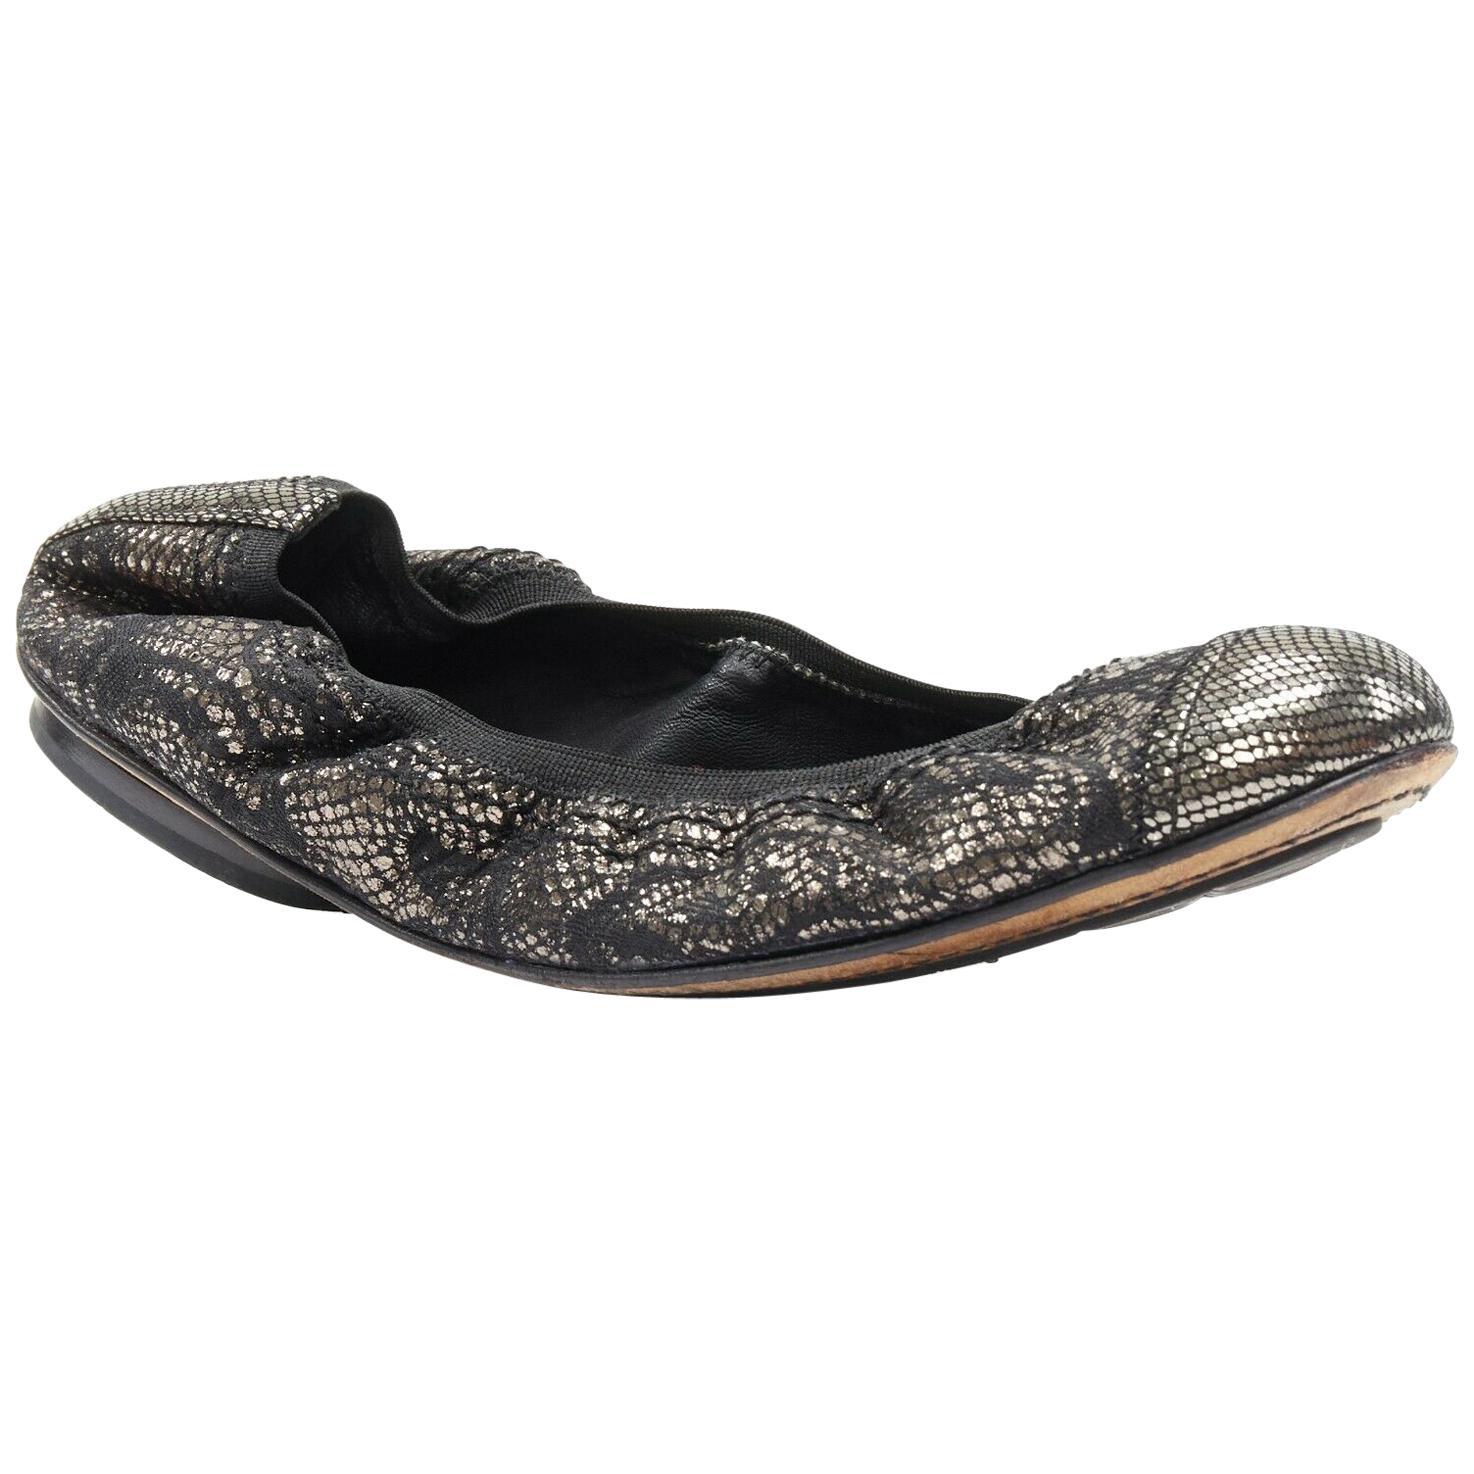 CHANEL metallic copper black print stretch fit flat ballerina flats EU36.5C